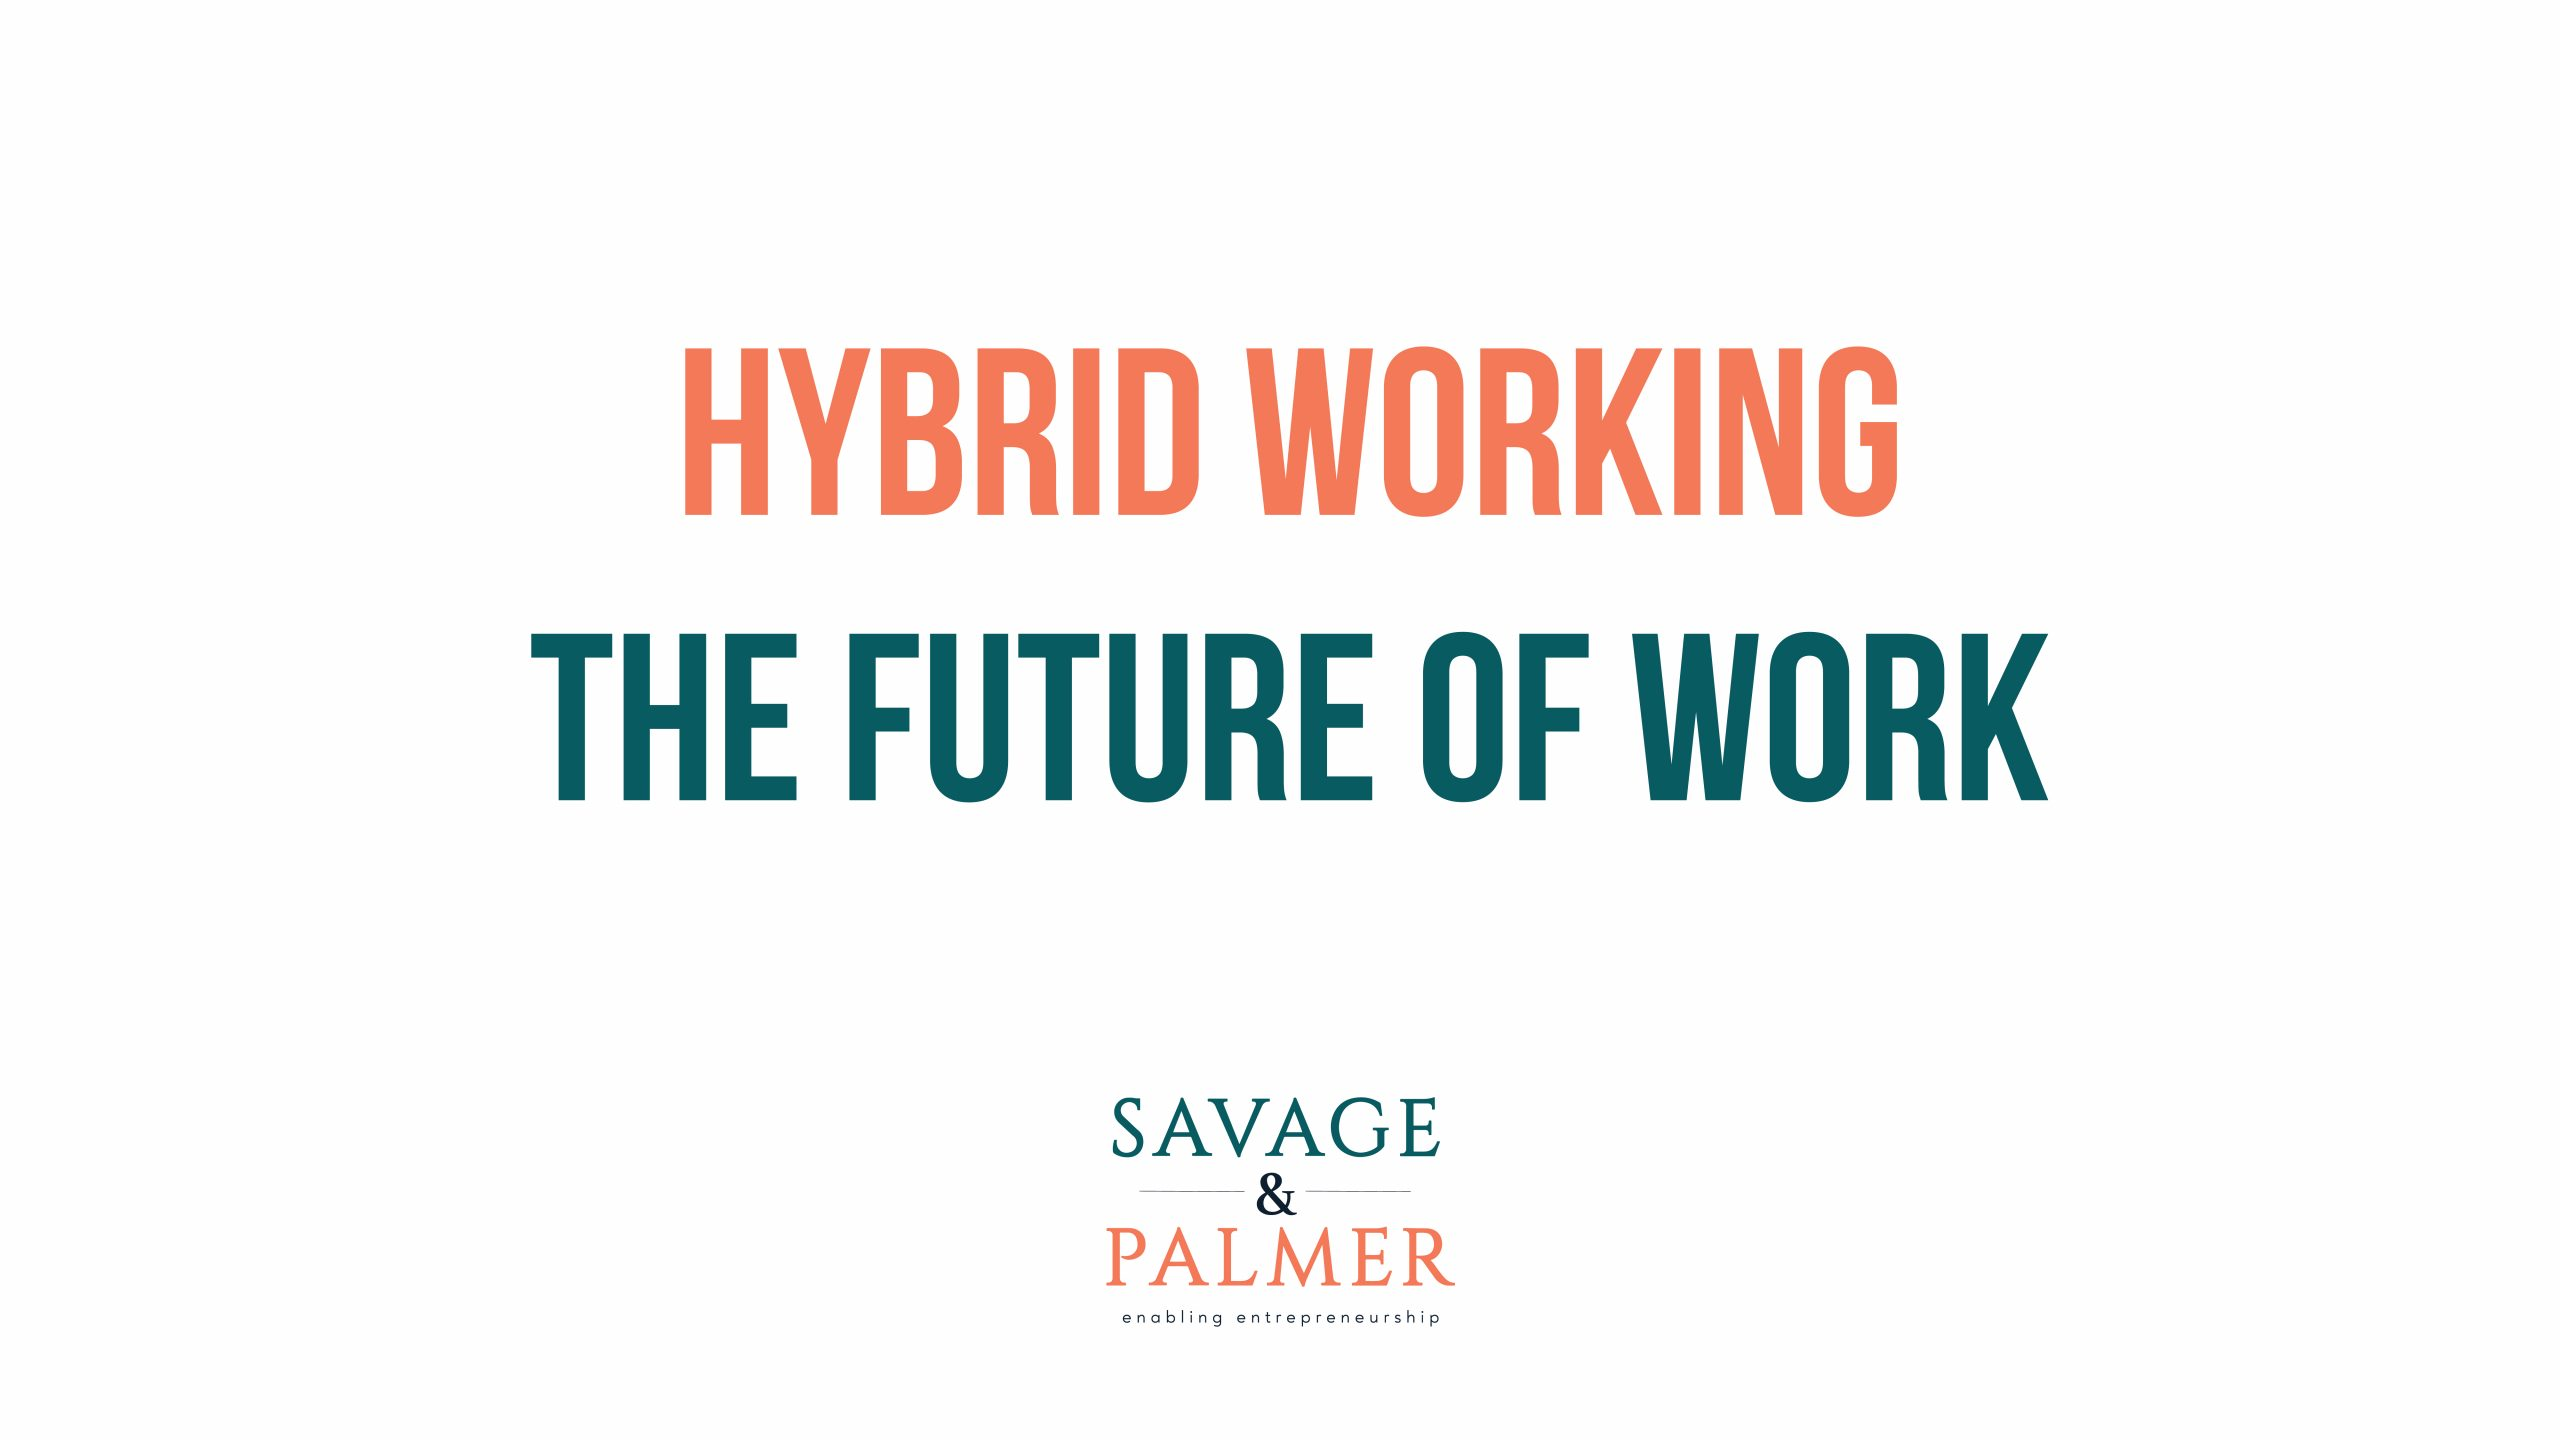 hybrid working